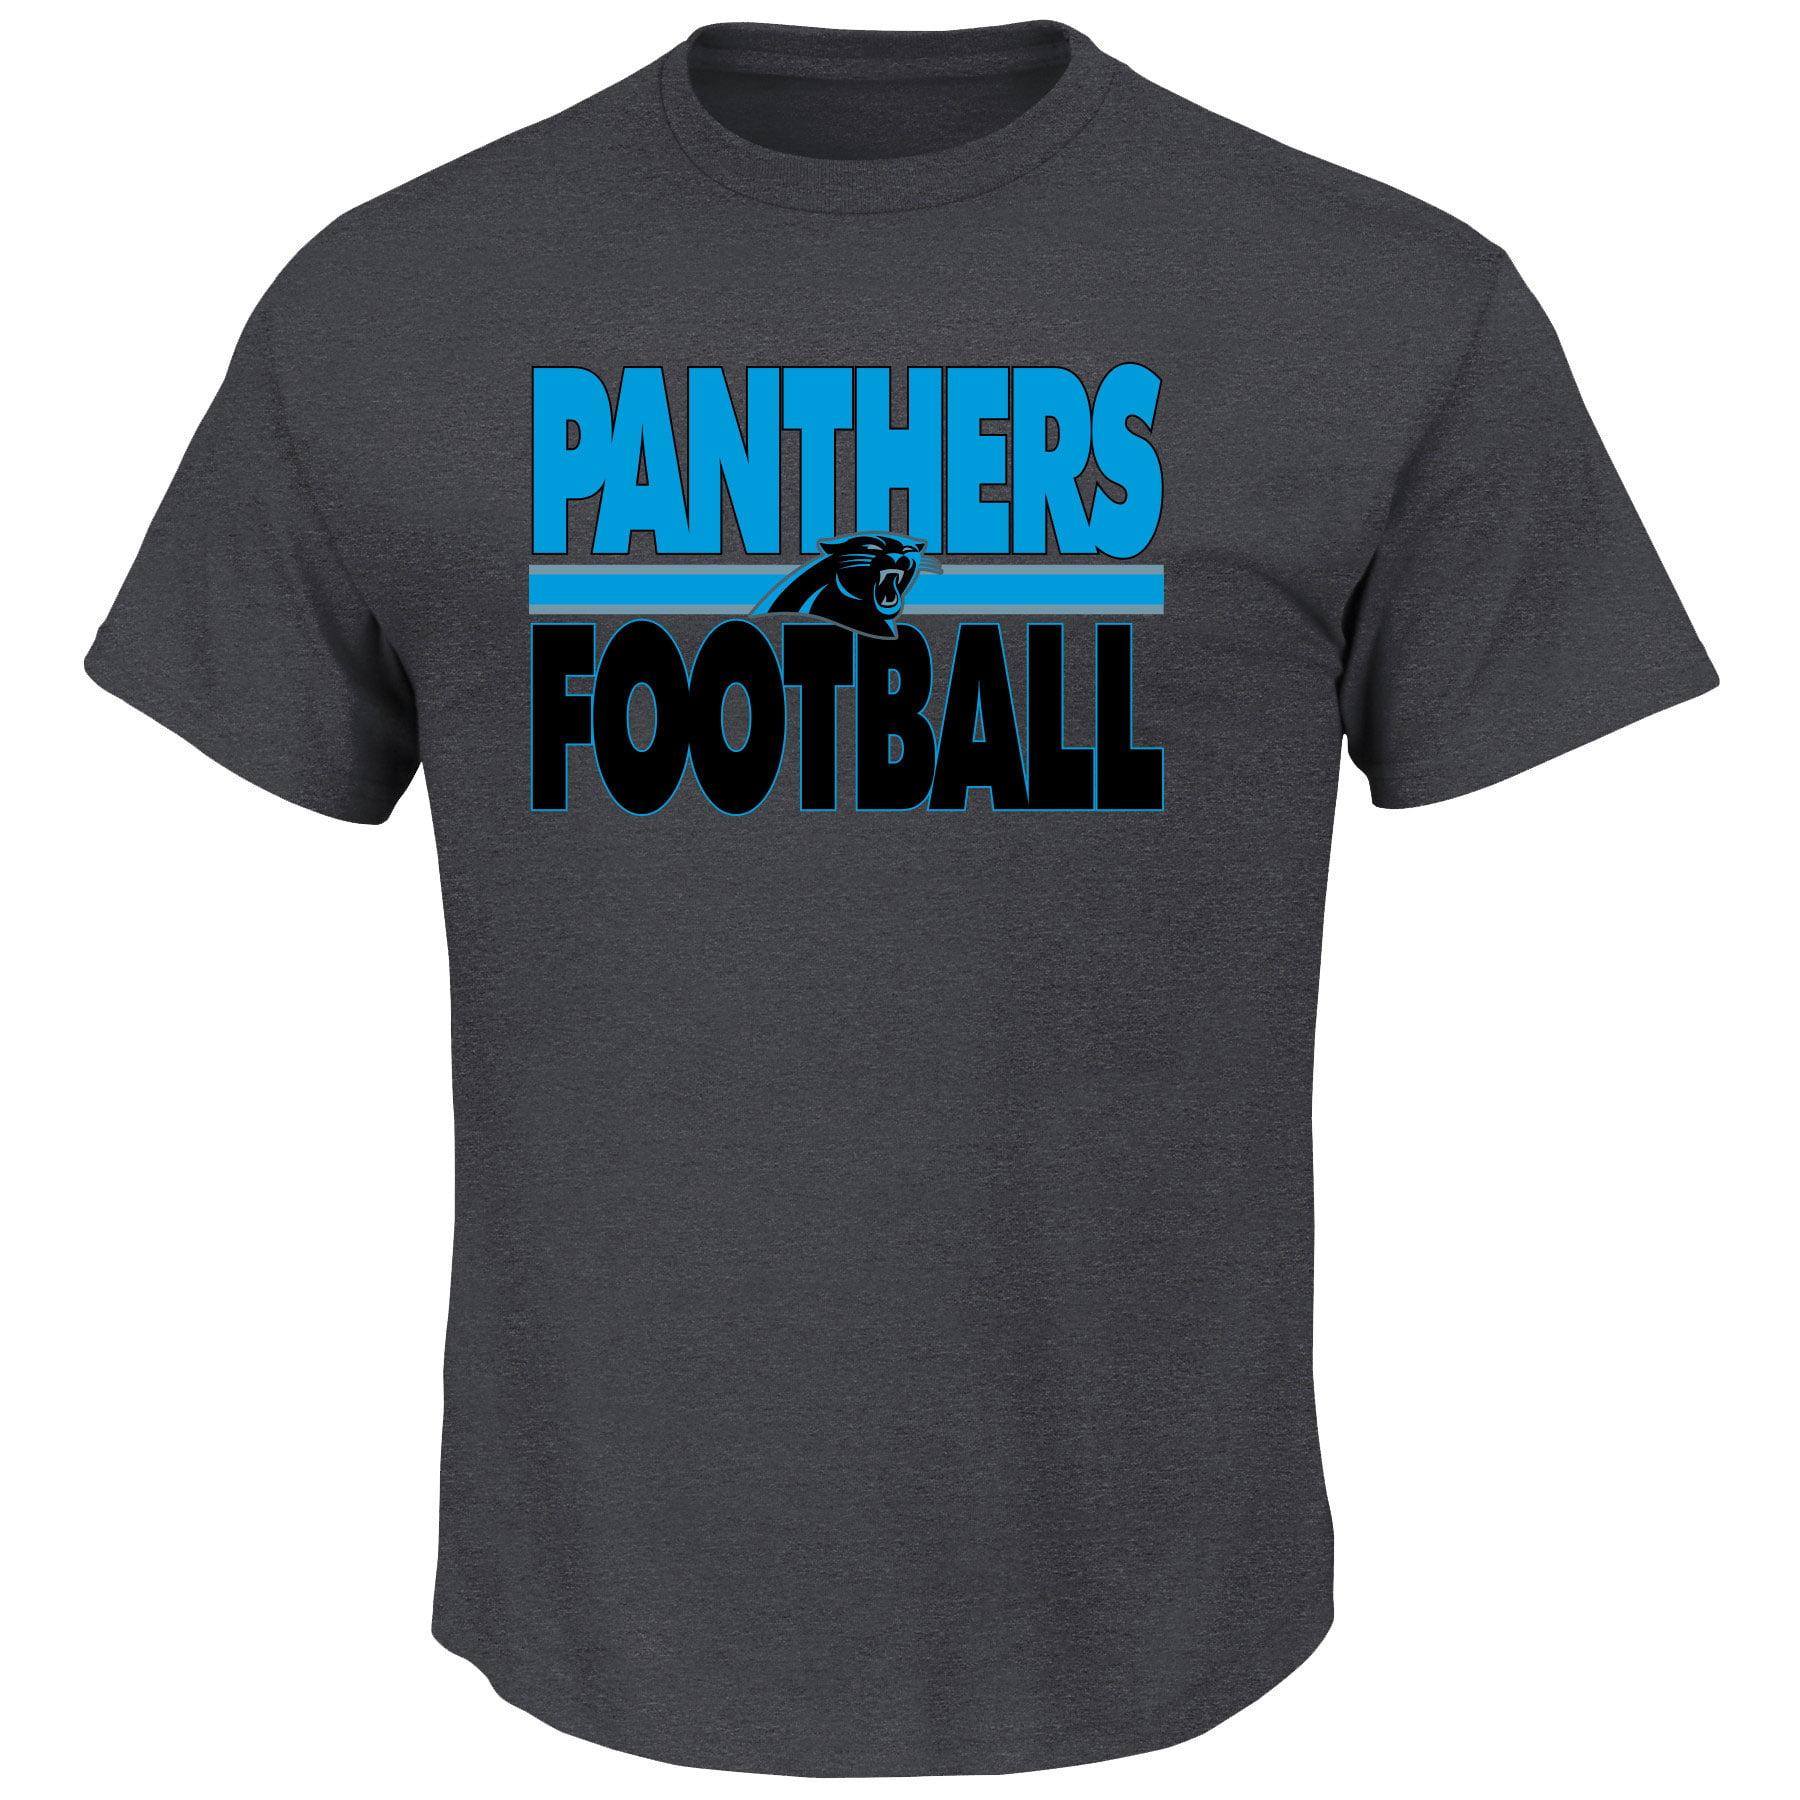 Carolina Panthers Custom Football 2 T-Shirt - Majestic - image 1 of 2